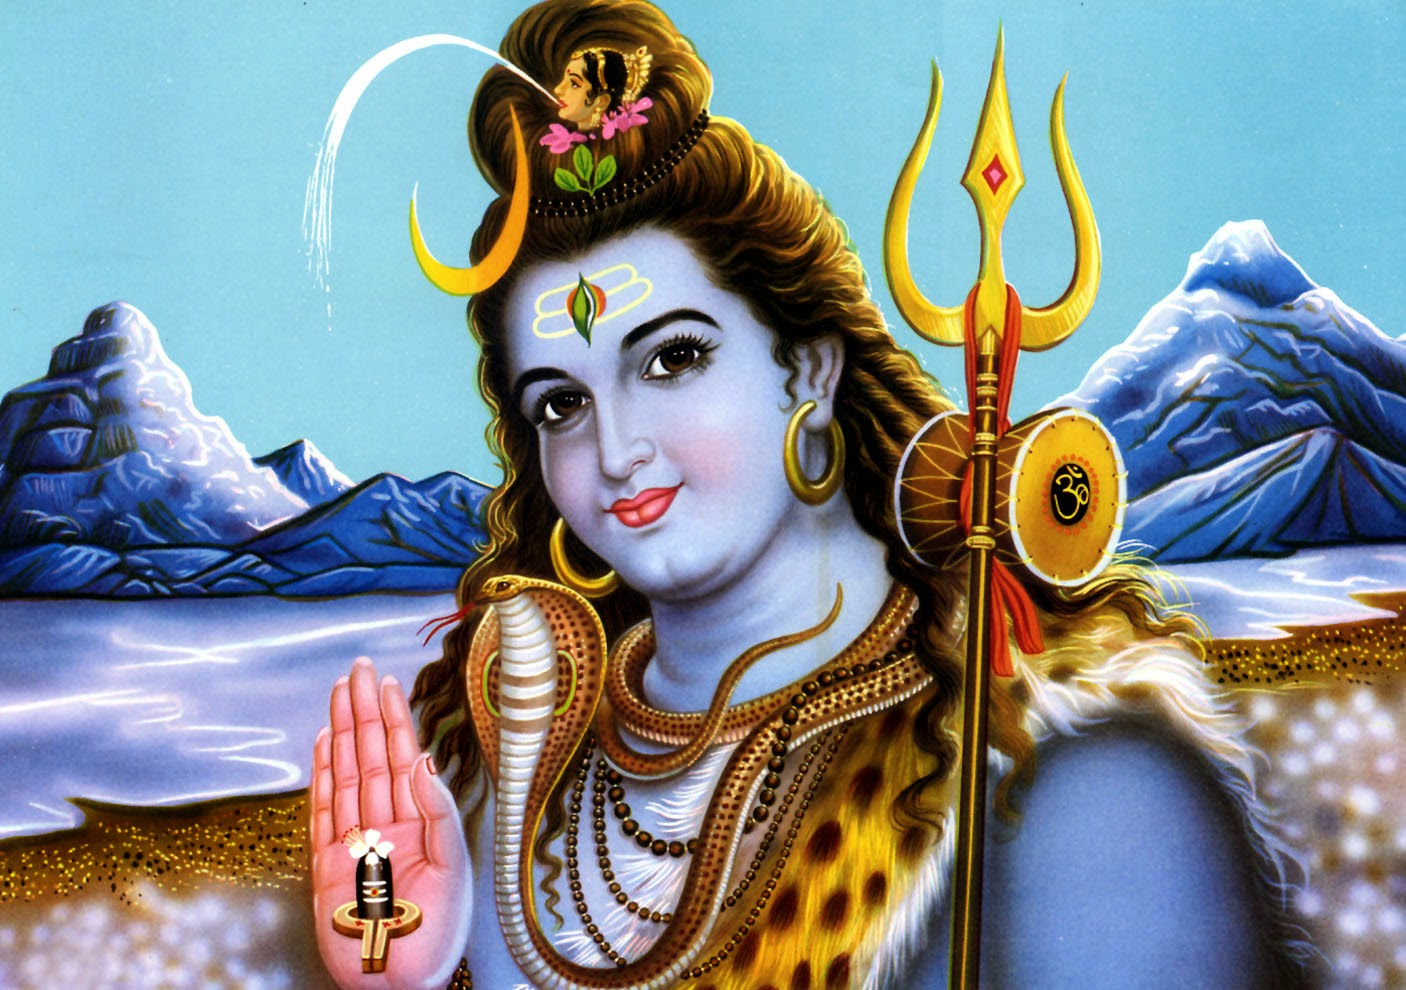 Shiva ashtottara shatanamavali 108 names of lord shiva mp3.